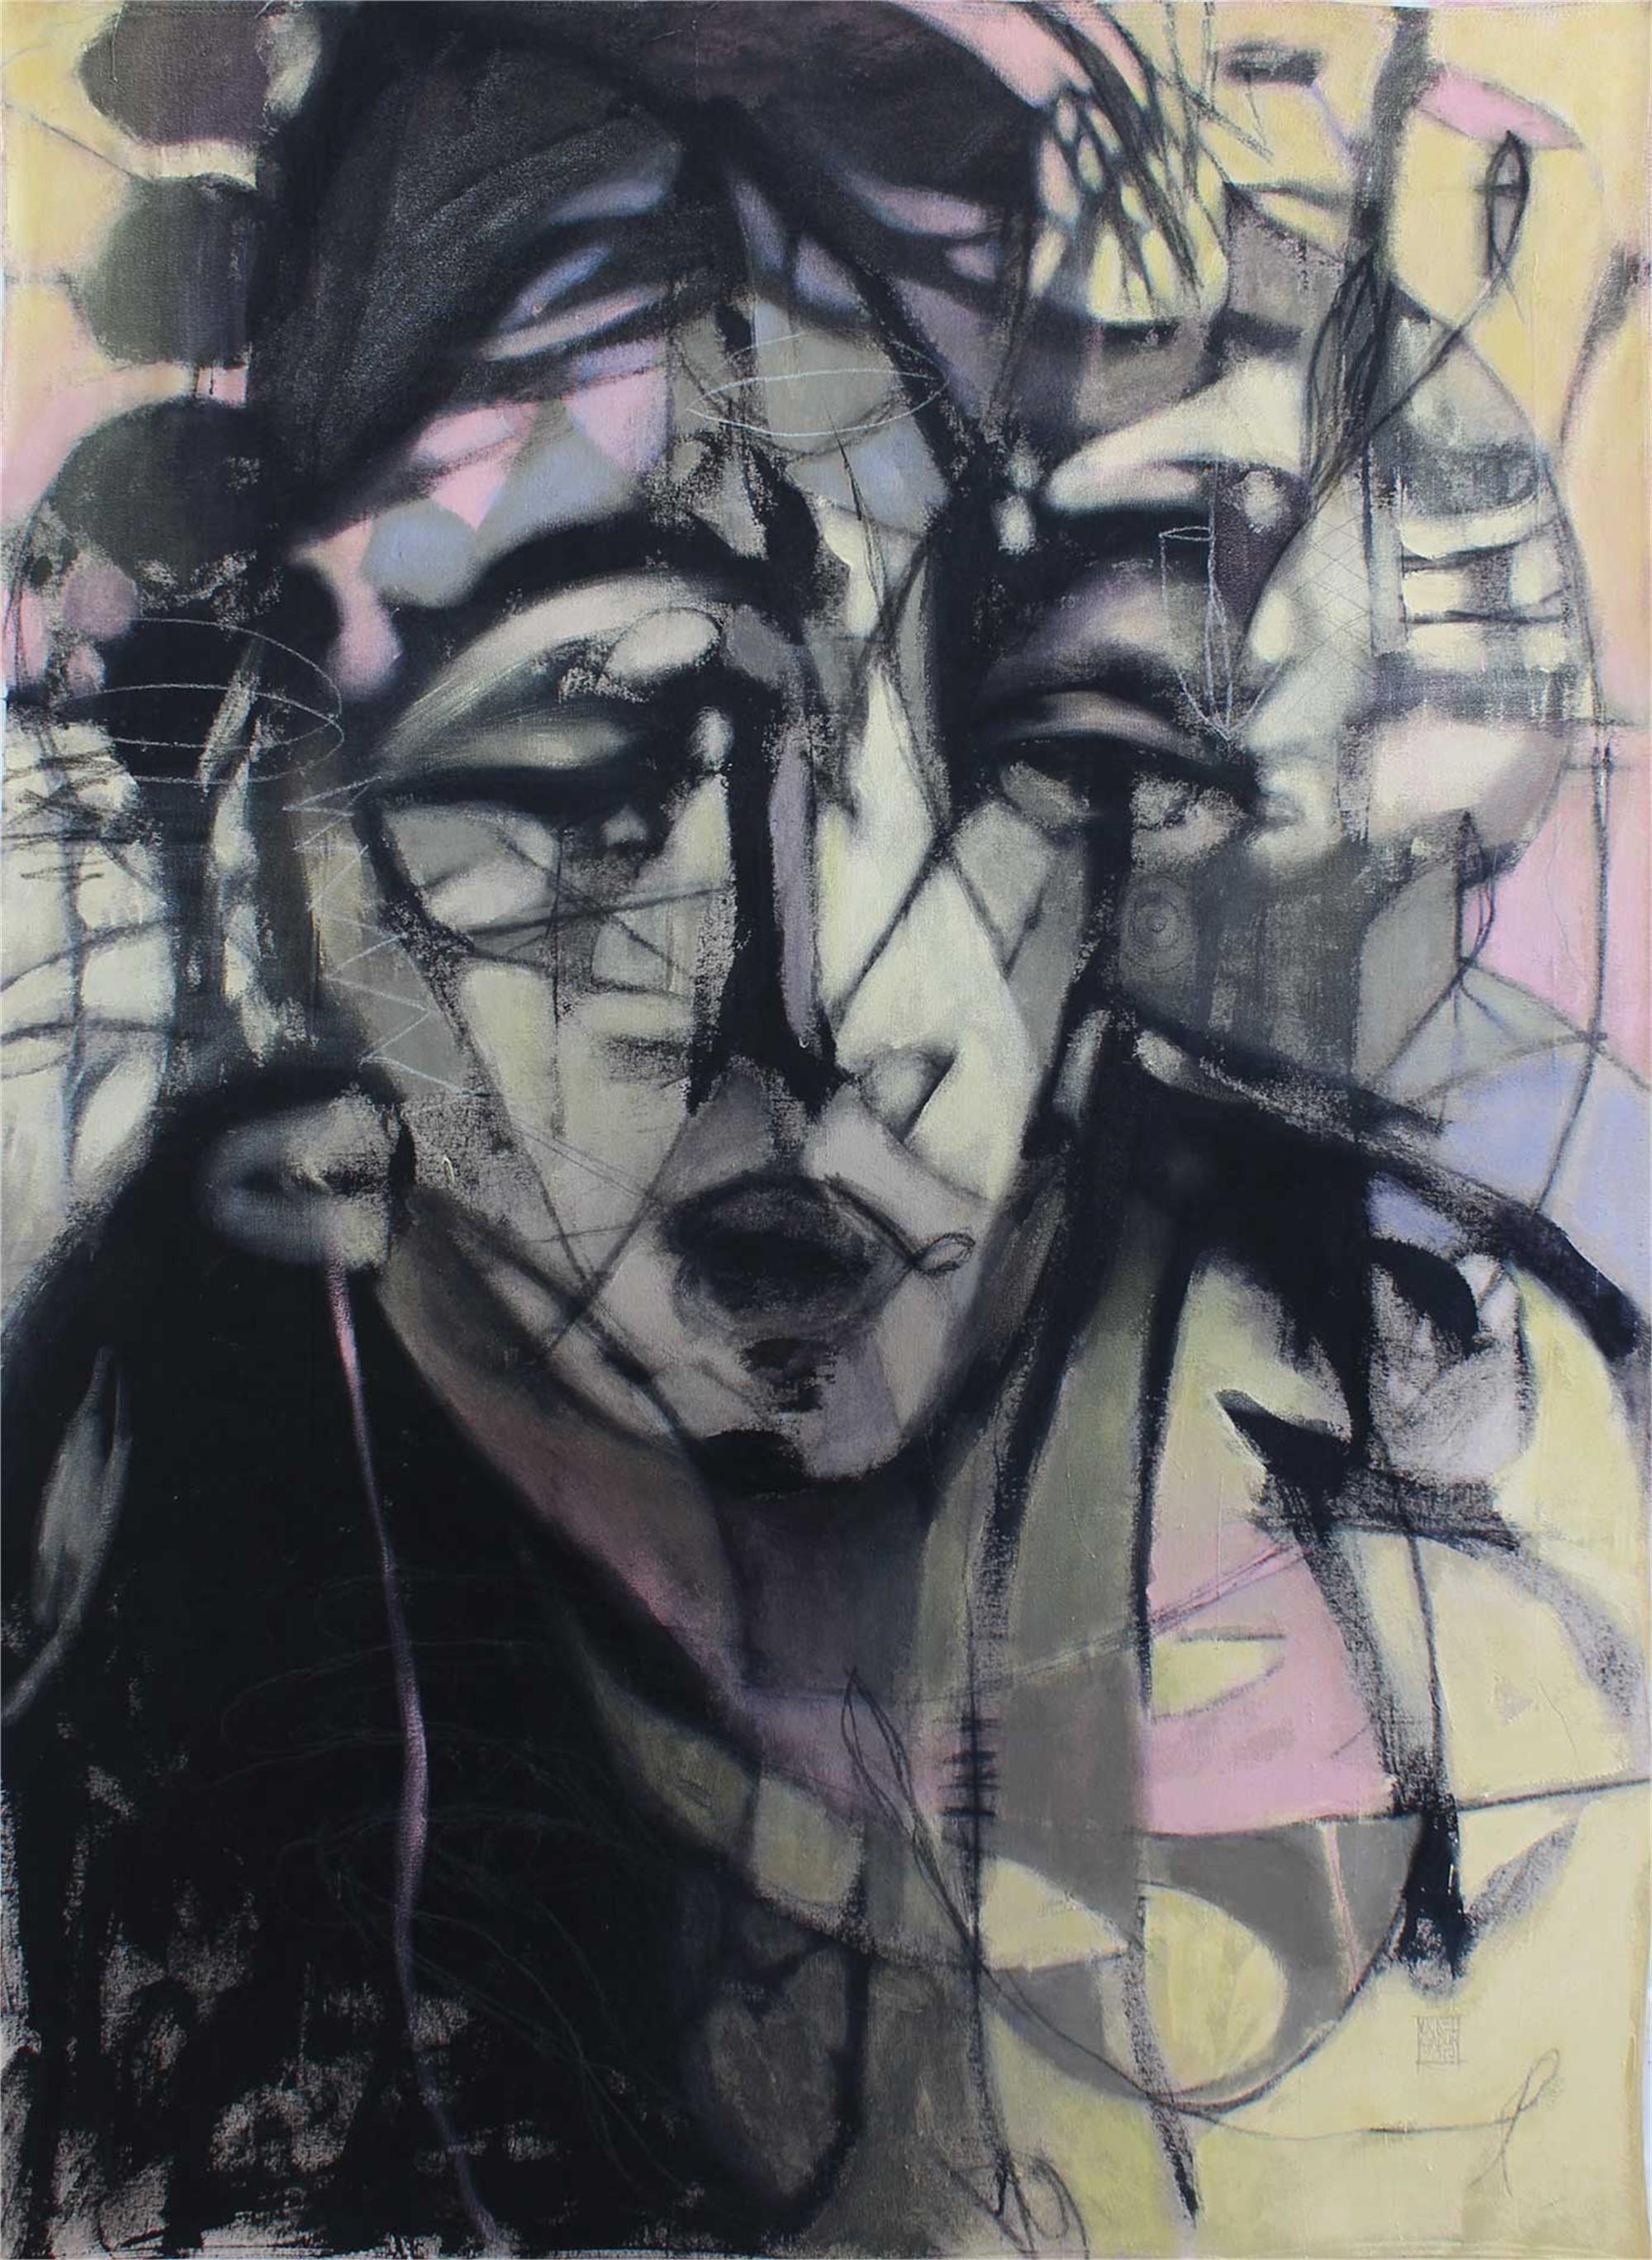 Pleasure of Temptation by Michael Gadlin